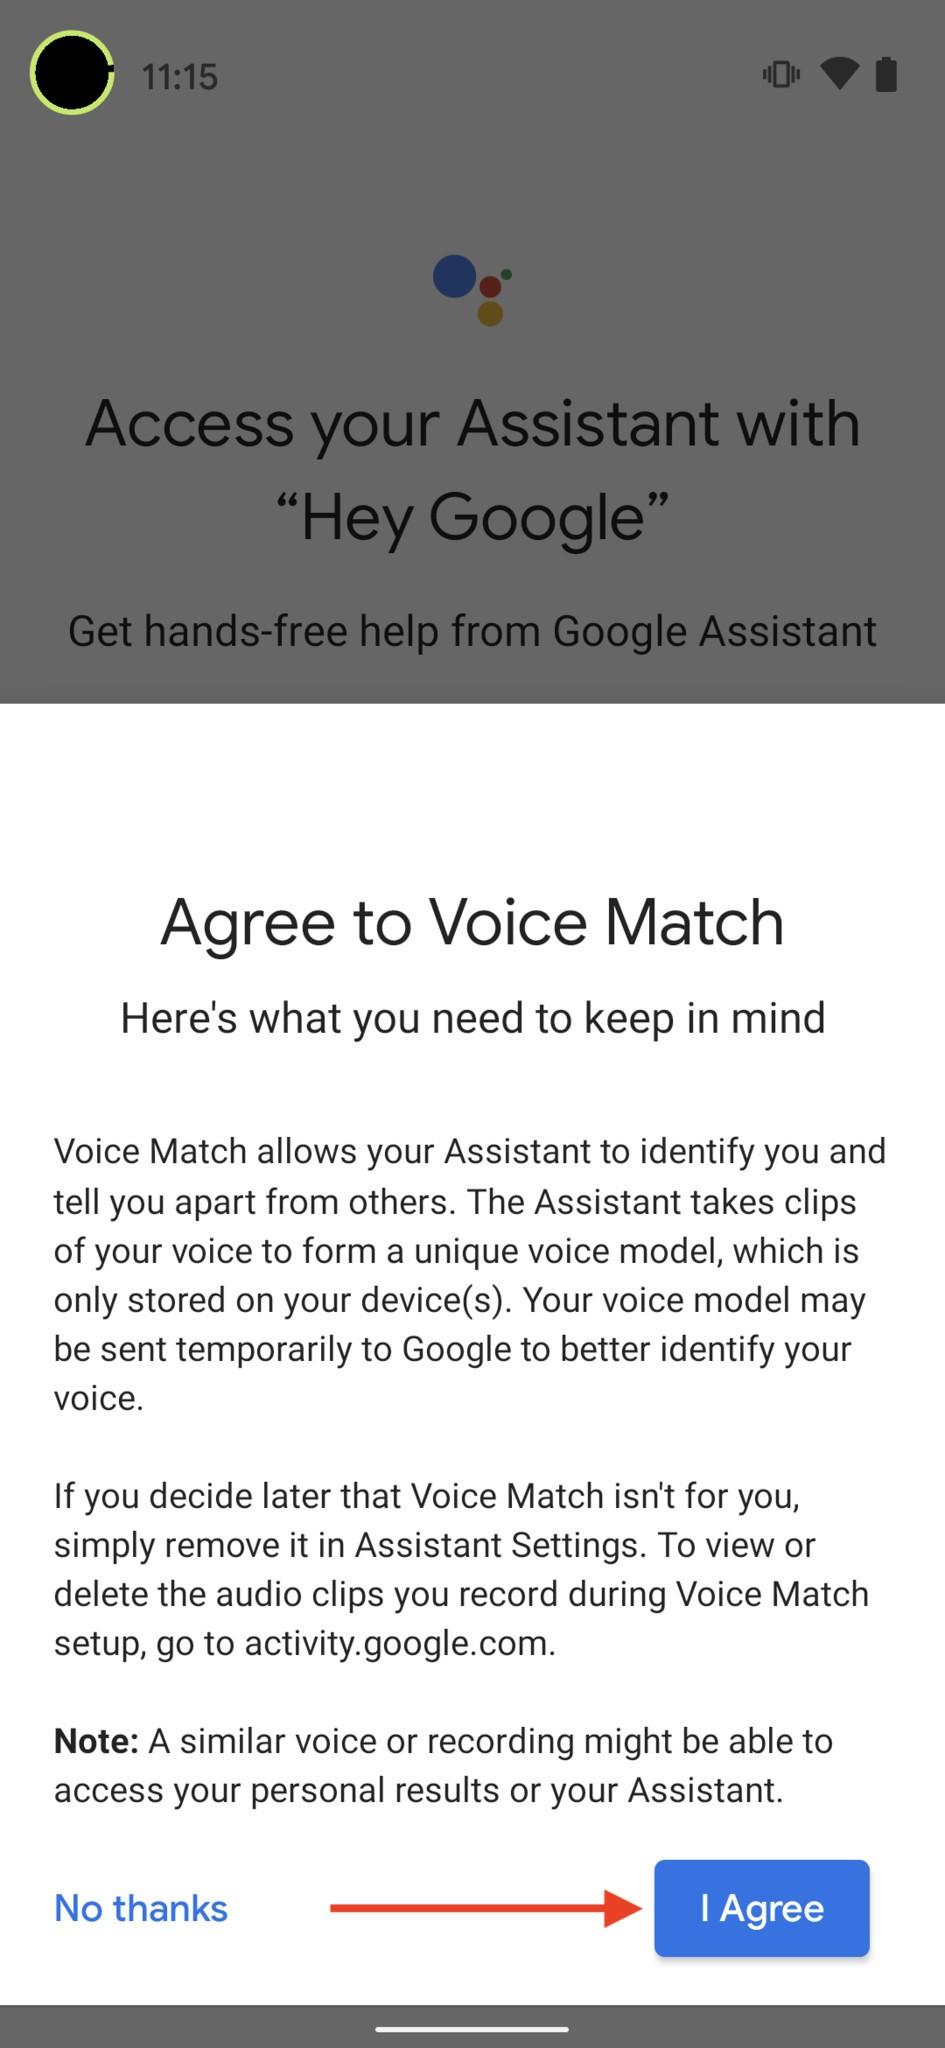 Bật tính năng Voice Match của Google Assistant